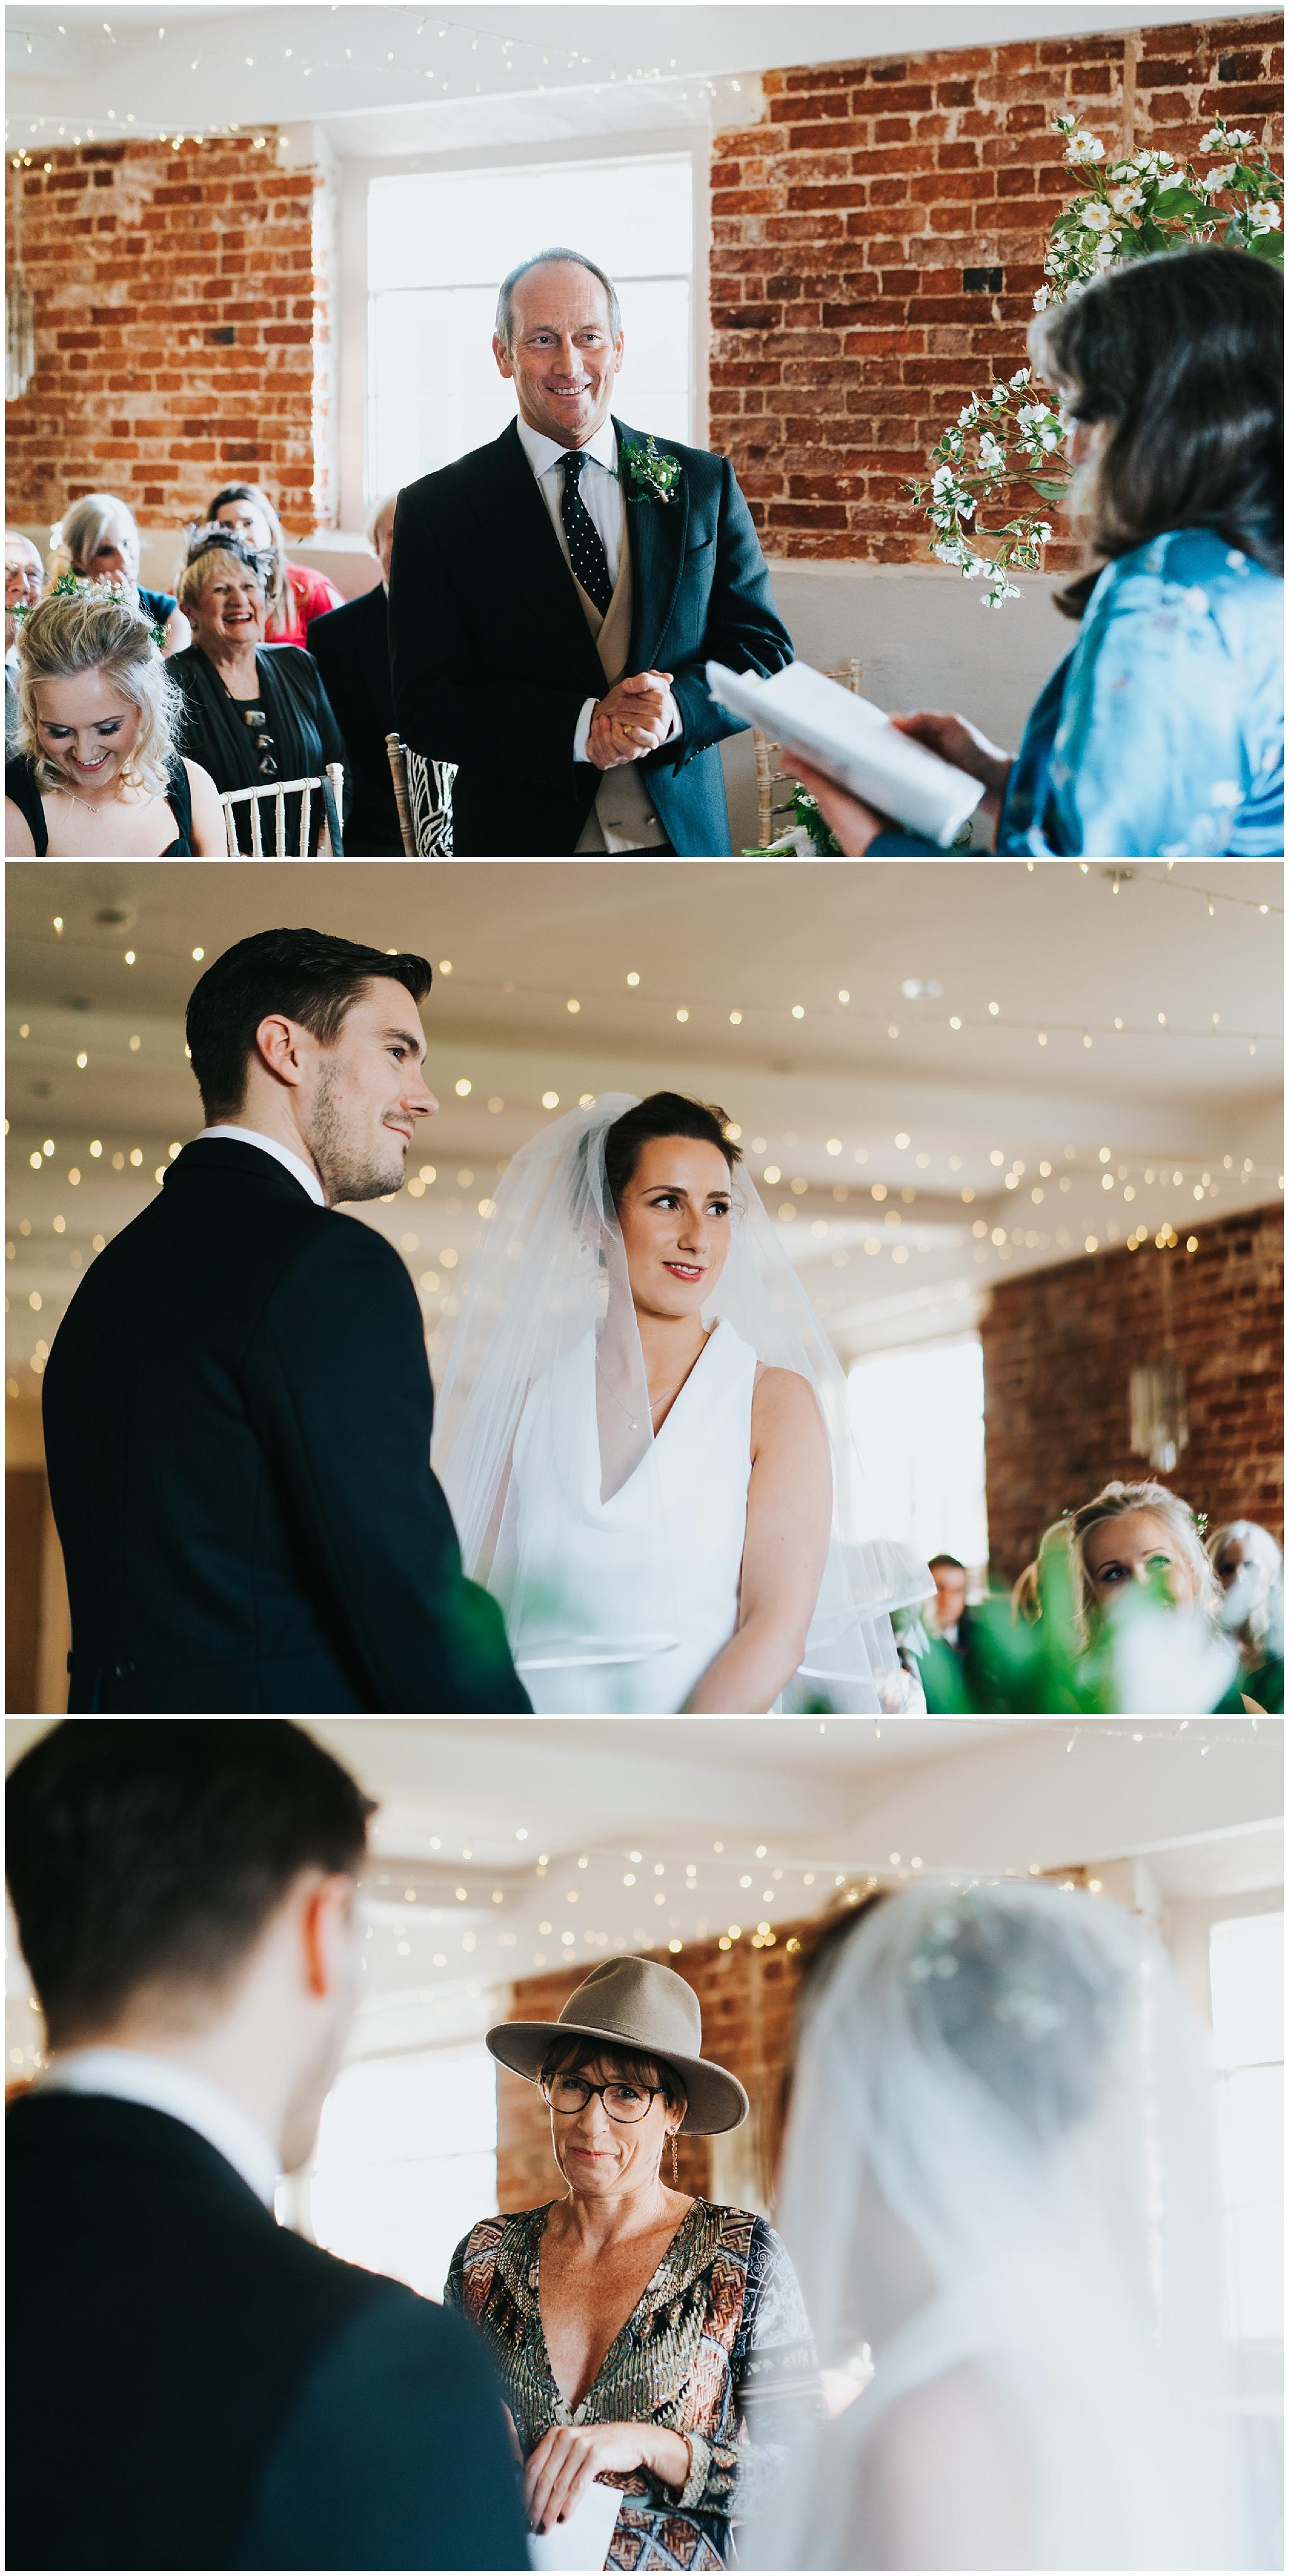 Sopley Mill Winter wedding